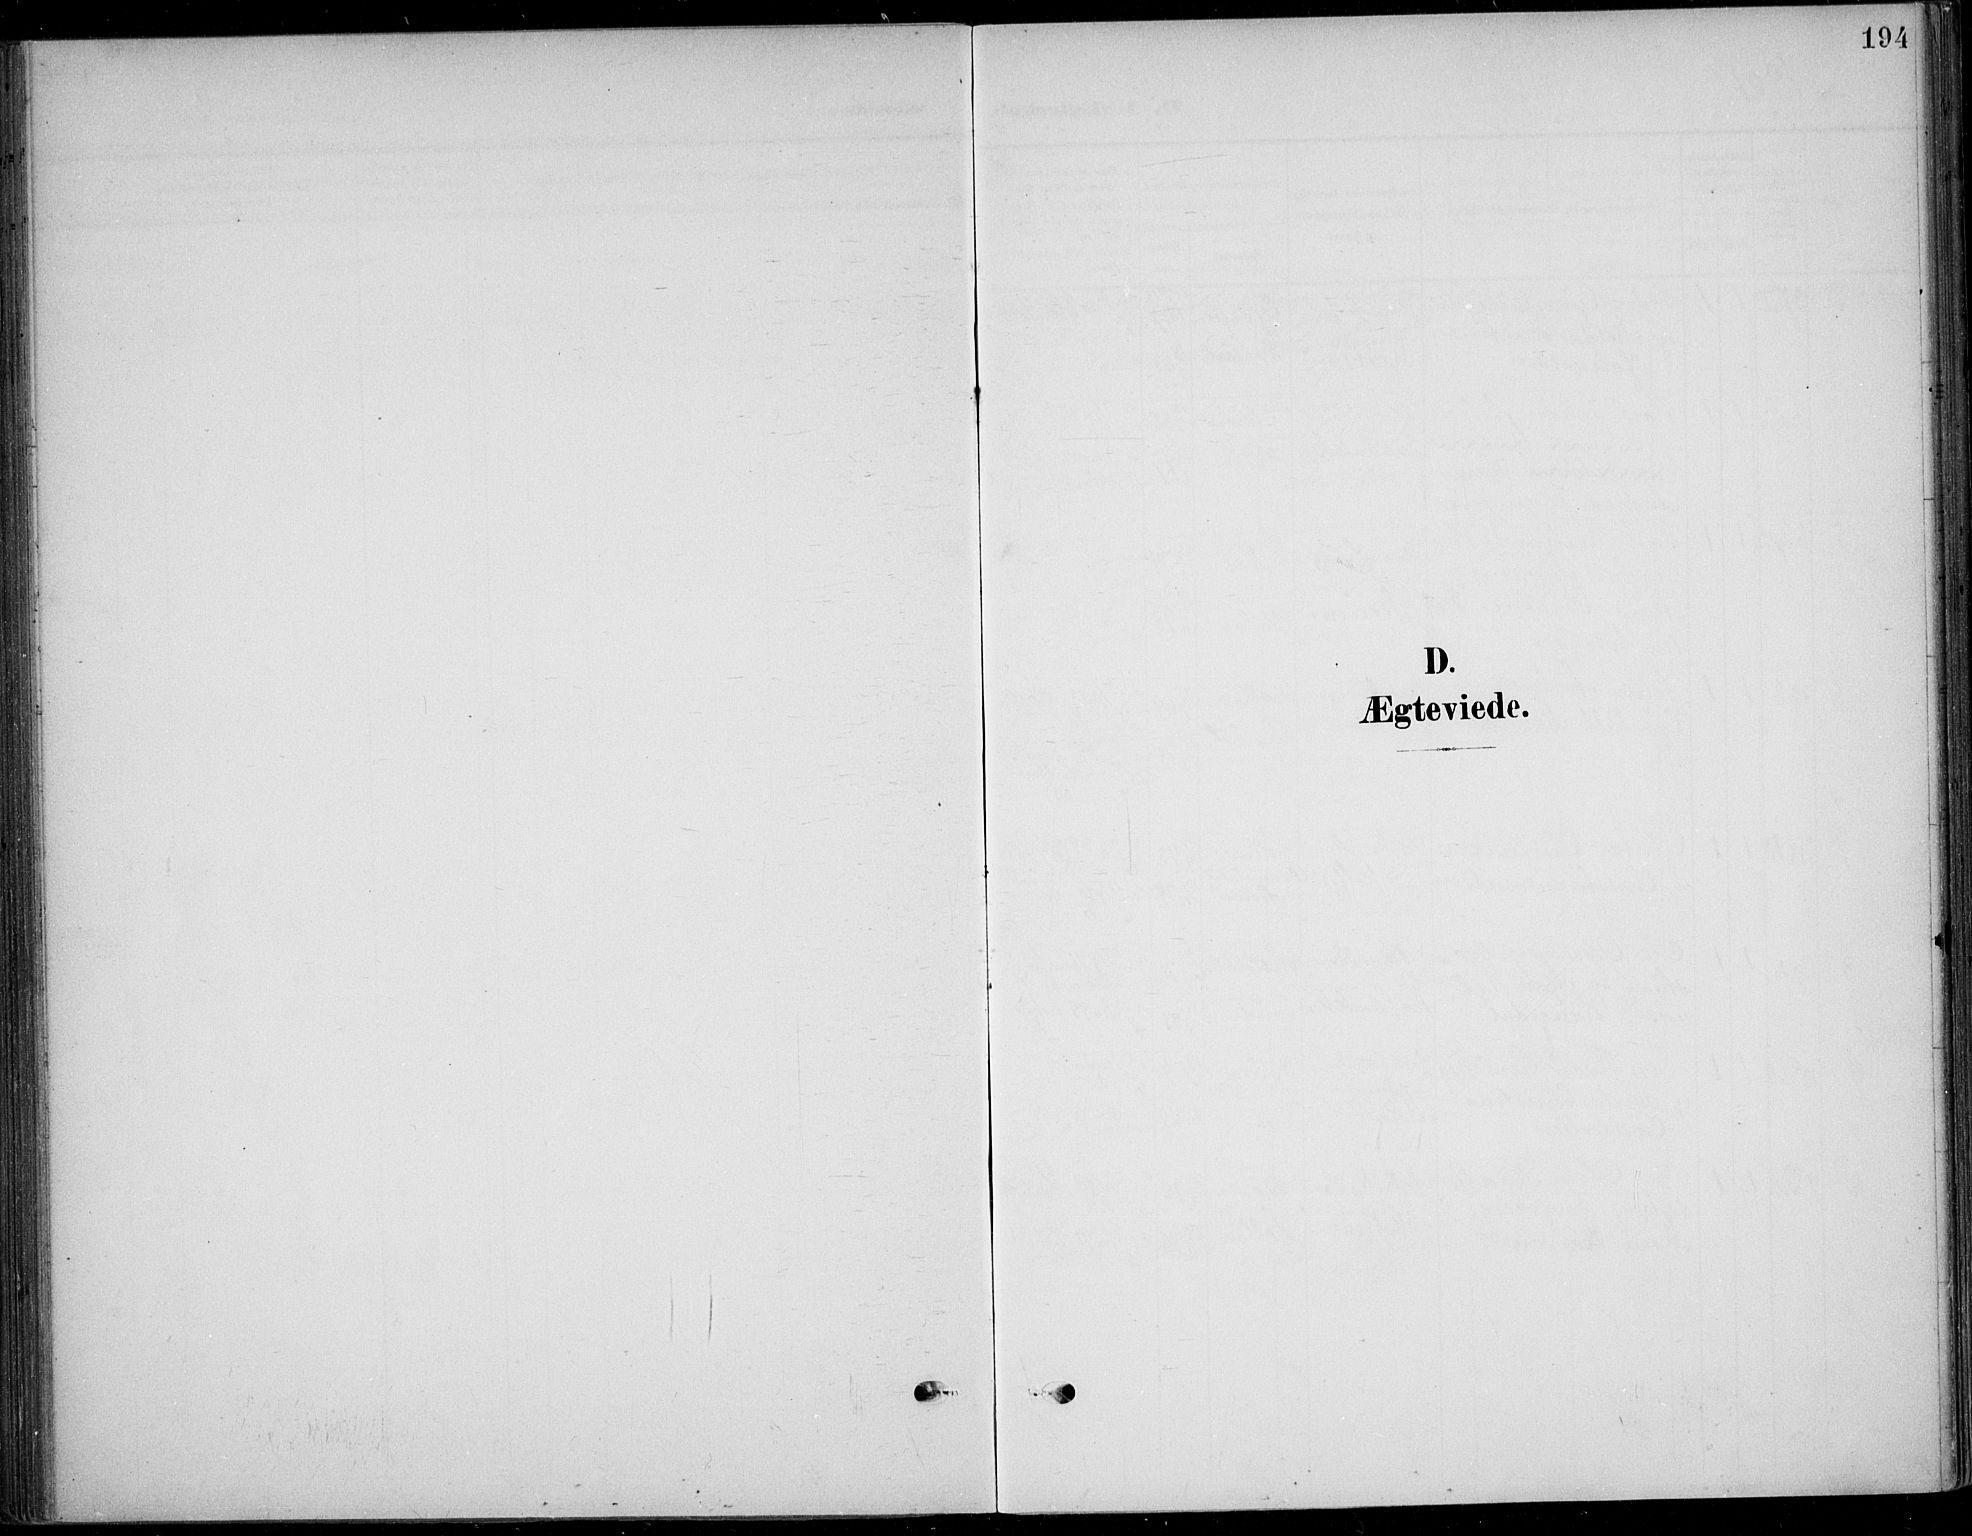 SAKO, Solum kirkebøker, F/Fb/L0003: Ministerialbok nr. II 3, 1901-1912, s. 194